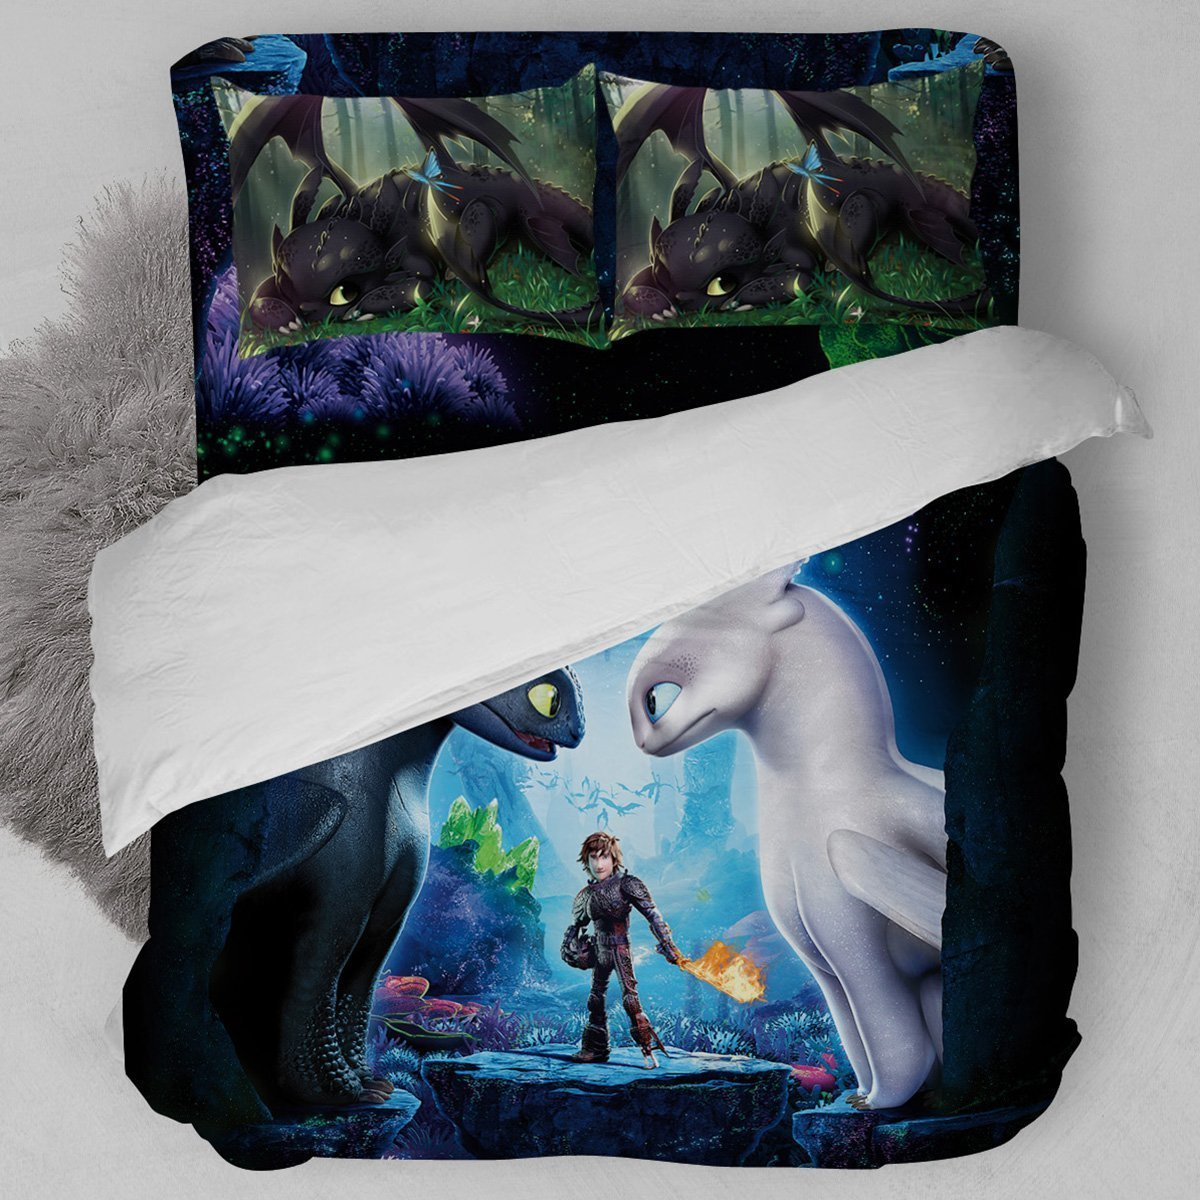 Dropshipping 3D Home Textile  2/3pcs Bedding Set Duvet Cover Beddingset Pillowcase  The Hidden World Bedding Set Dragon